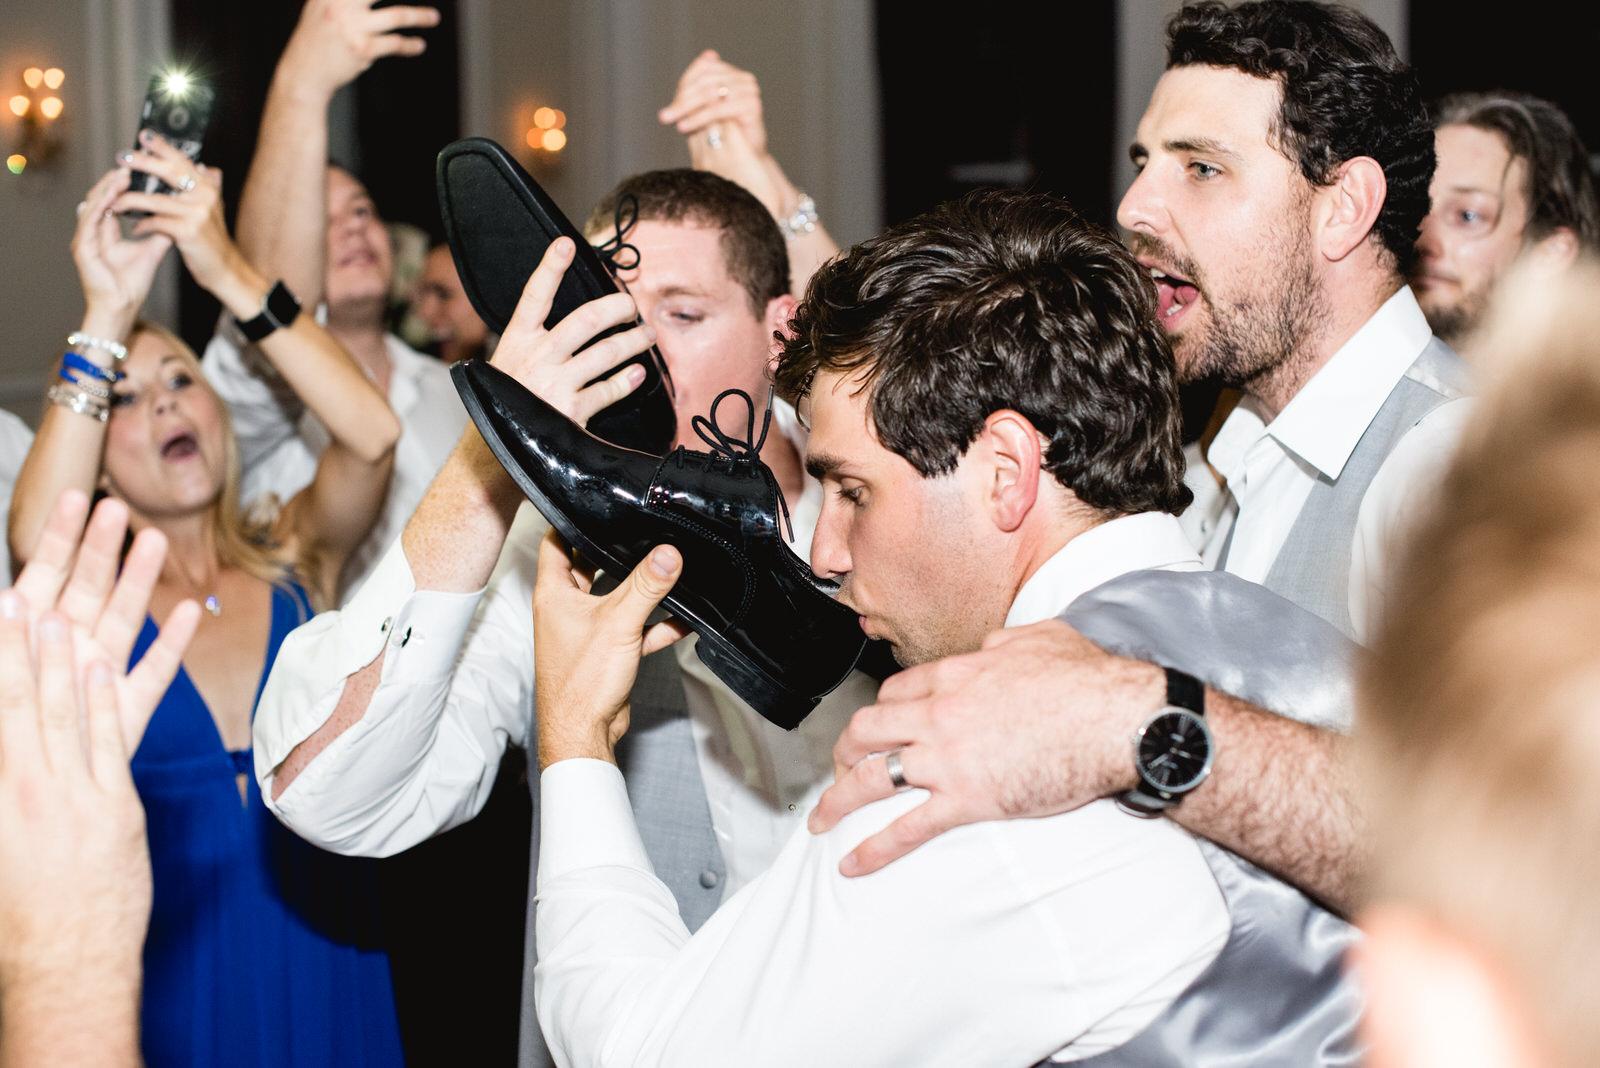 university_club_pittsburgh_wedding_photos_014.jpg